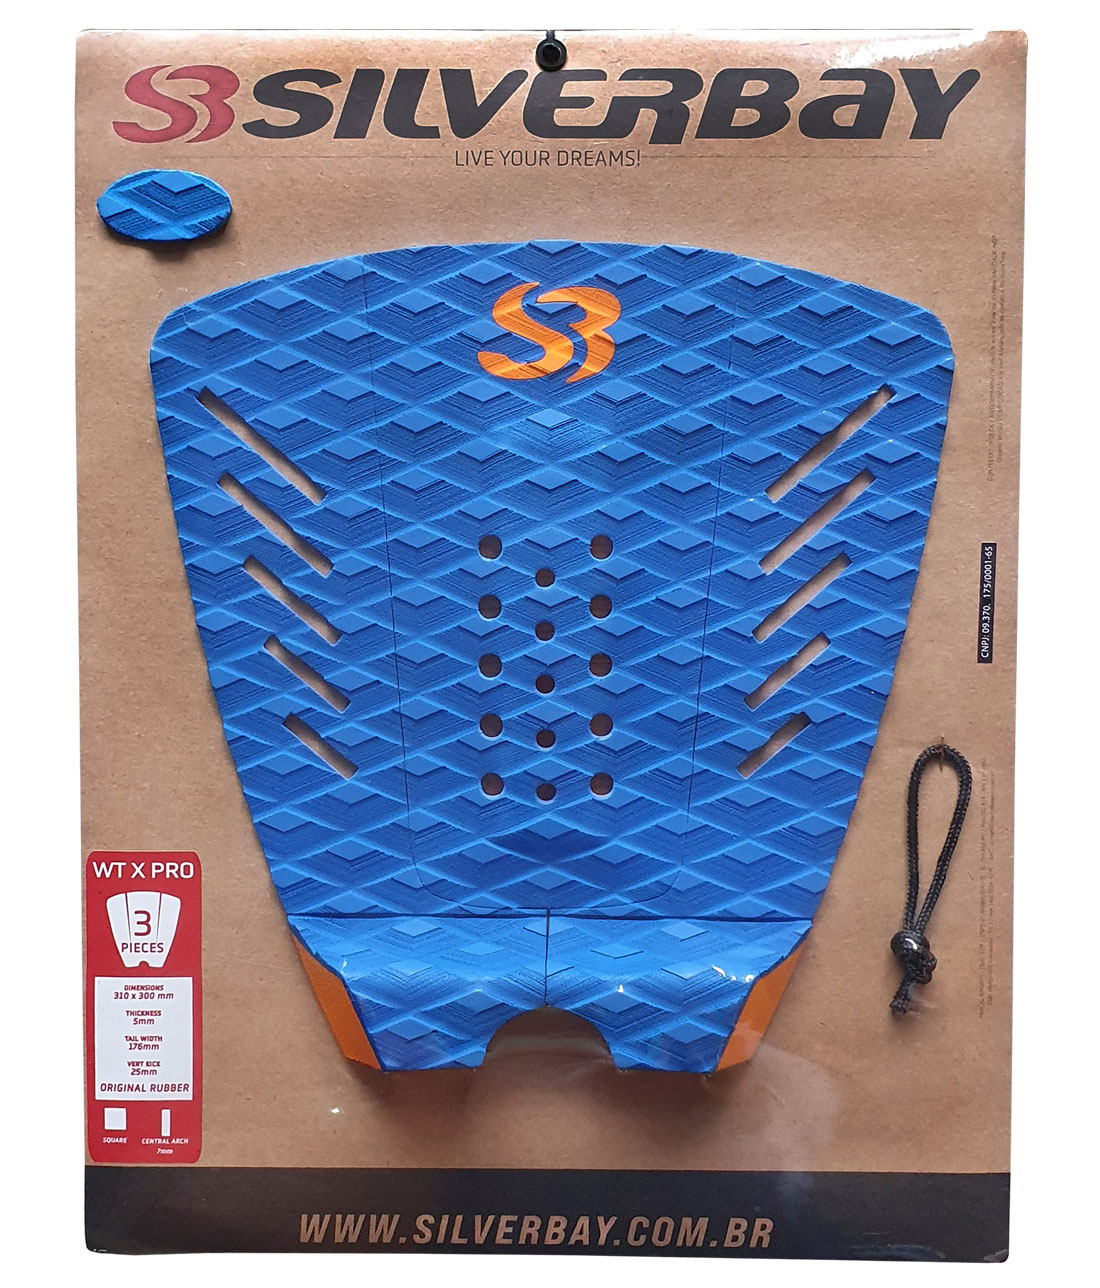 Deck Silverbay WT X Pro